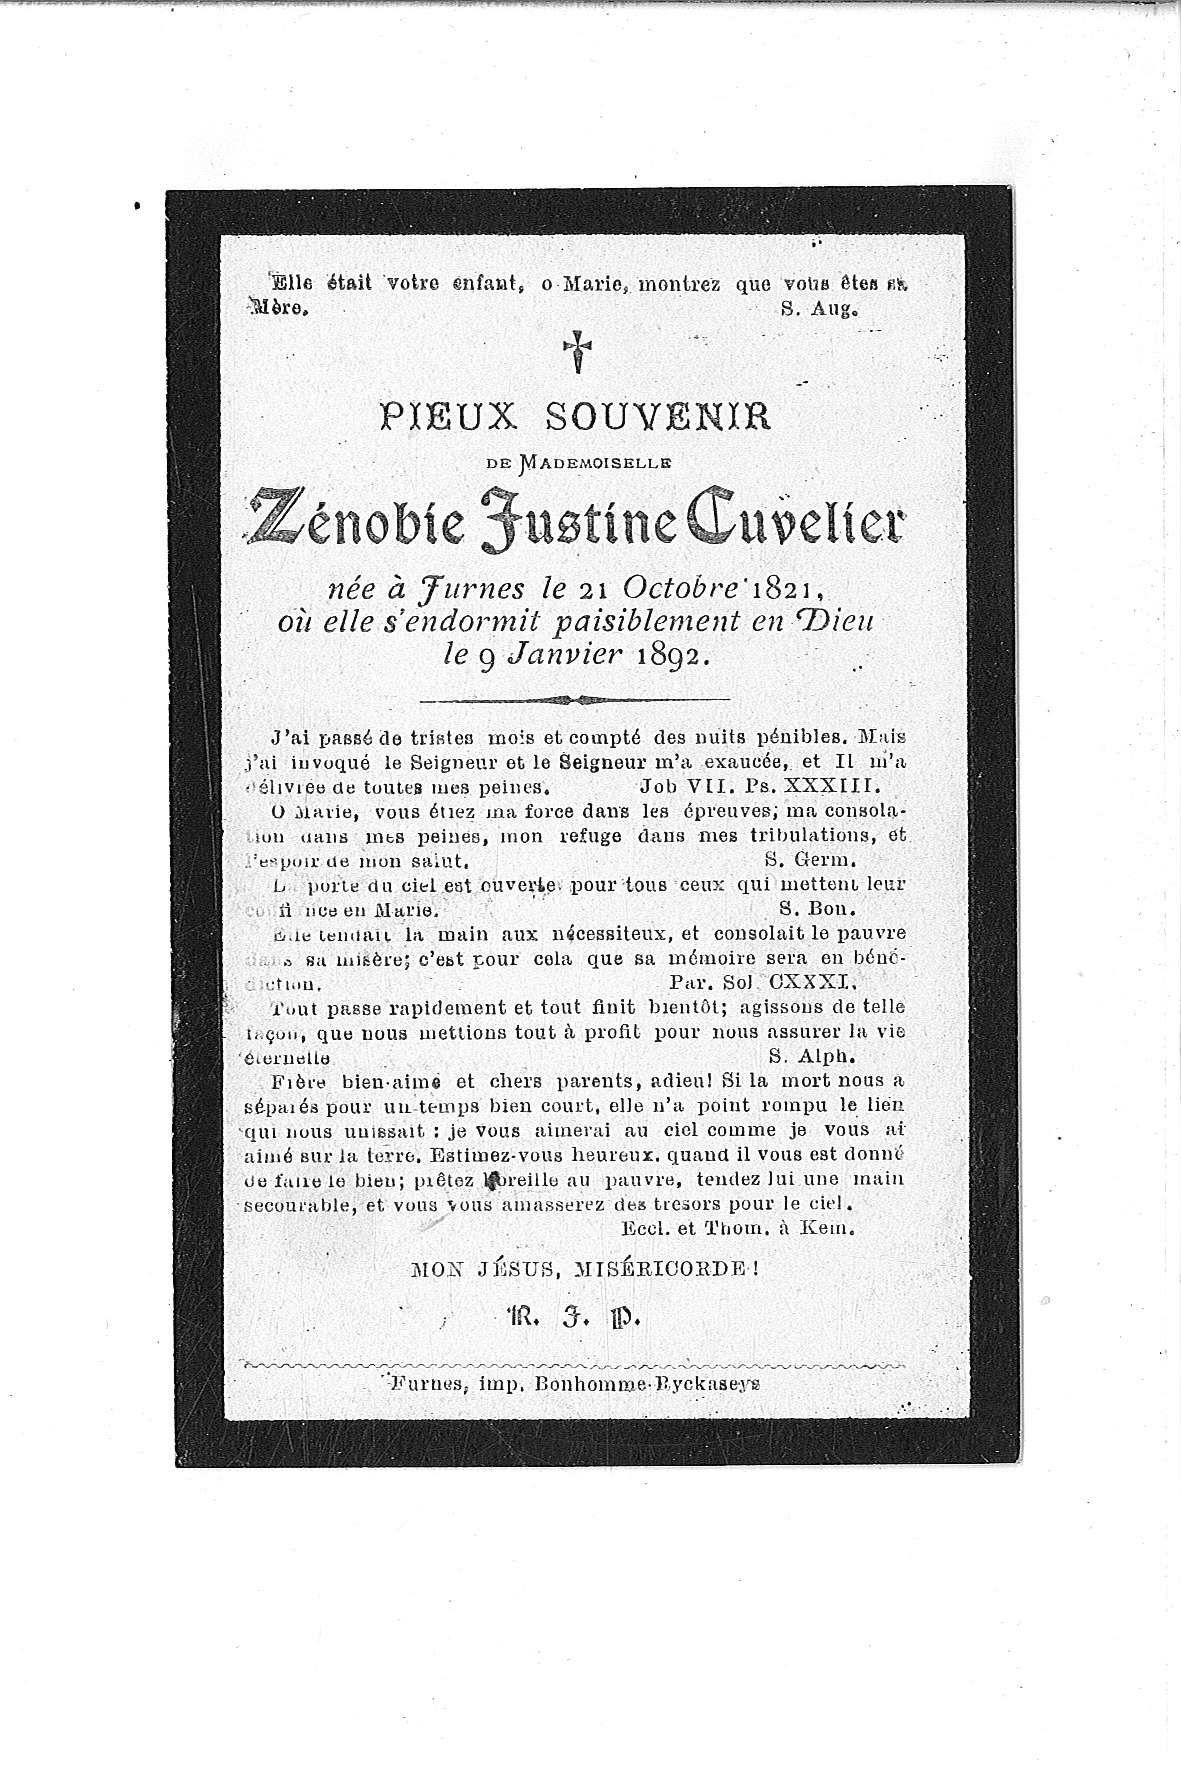 zénobie-justine(1892)20120426085242_00001.jpg